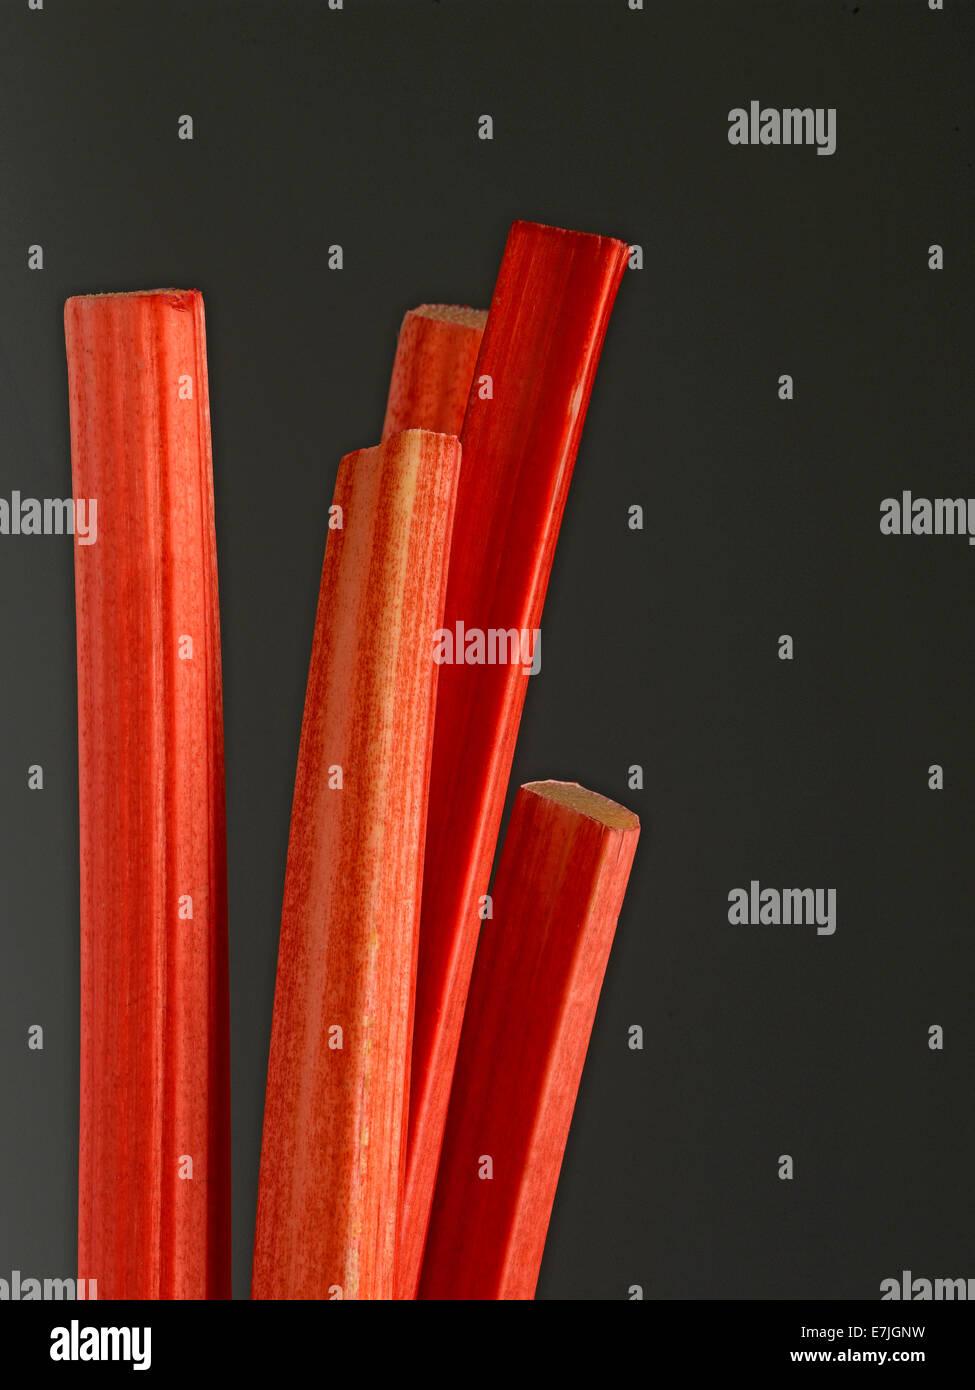 Rhubarb sticks - Stock Image